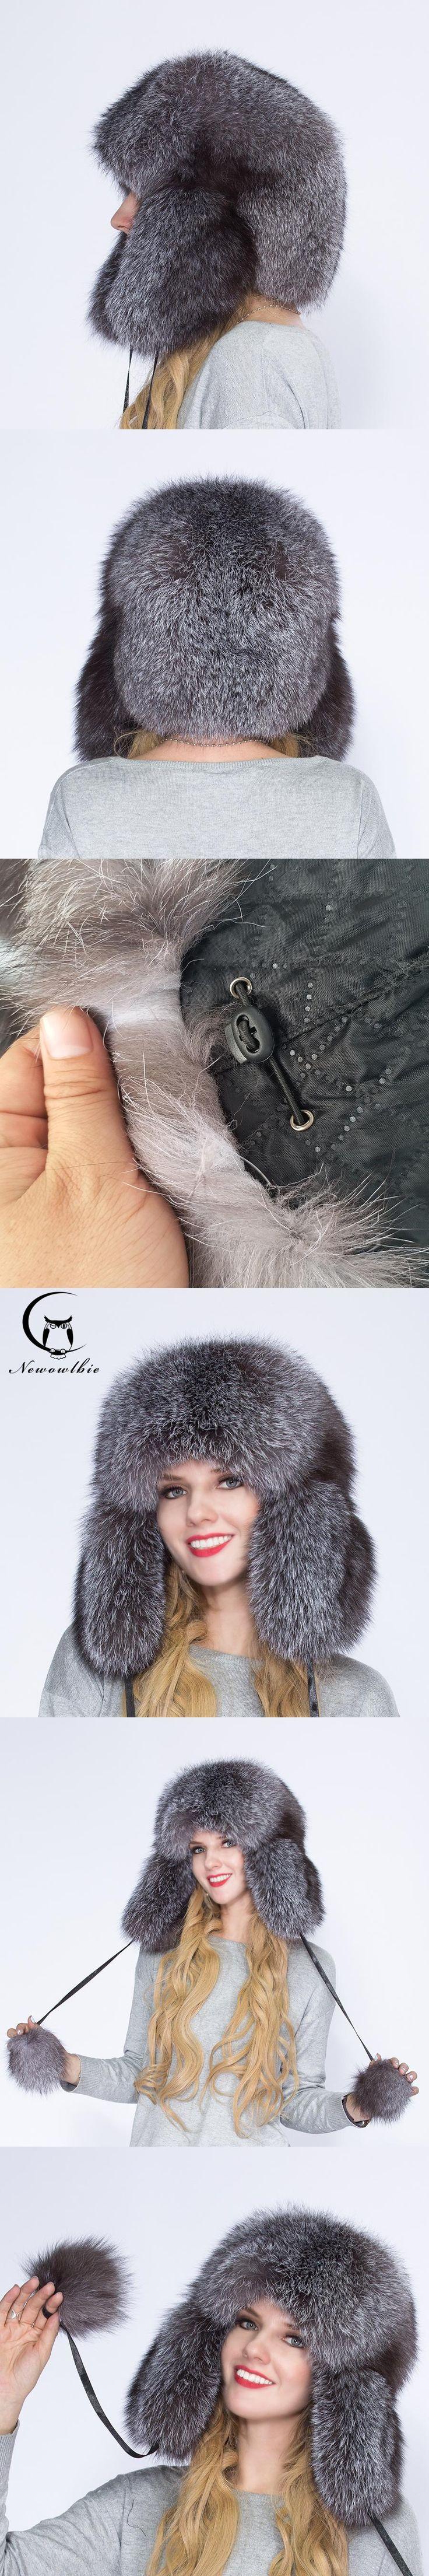 2017 100% natural fox fur men and women winter hat, warm and comfortable, full of silver fox fur tyrant cap, ear cap